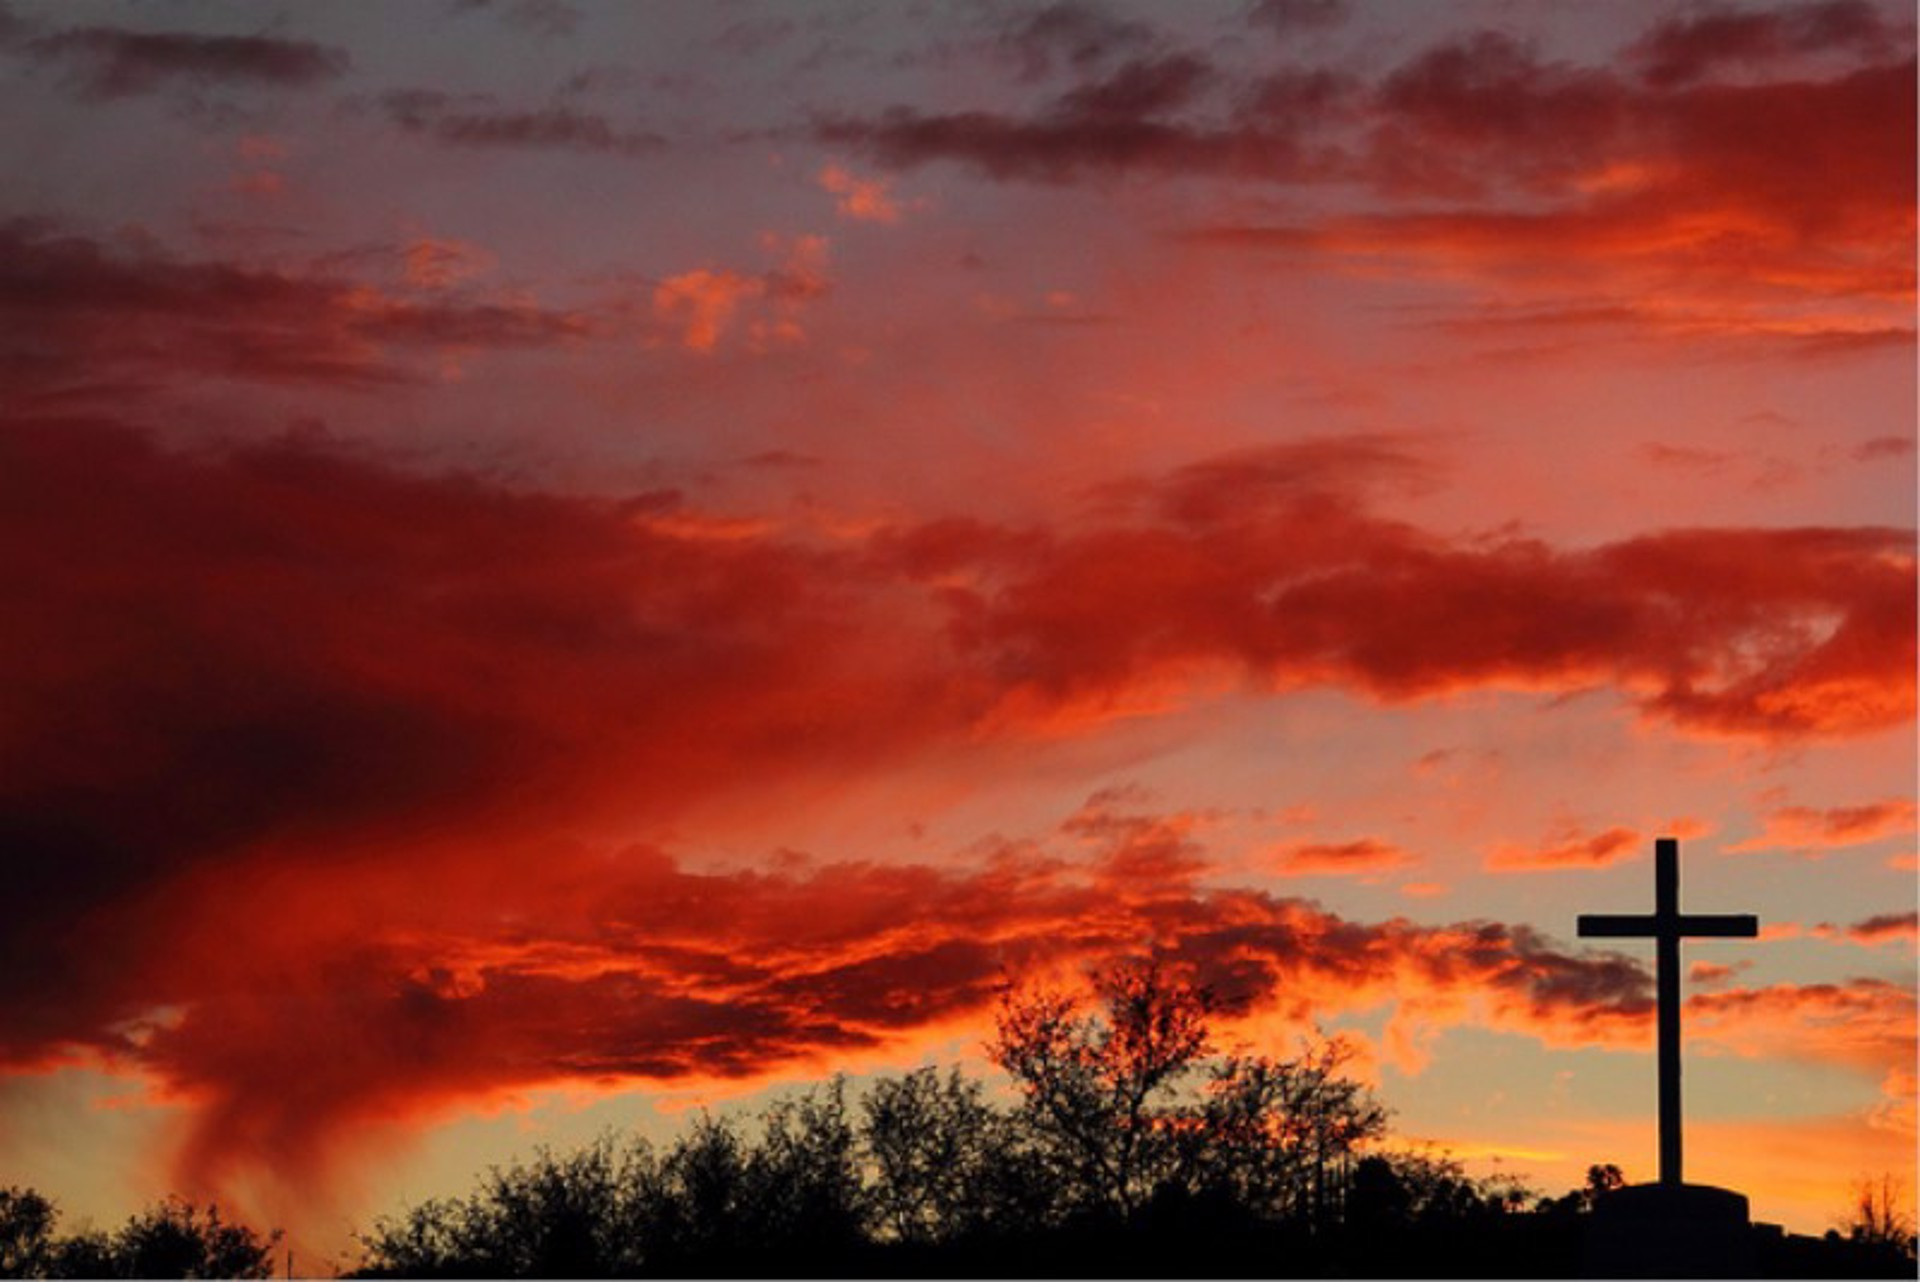 Cross At Sunset by John Hays